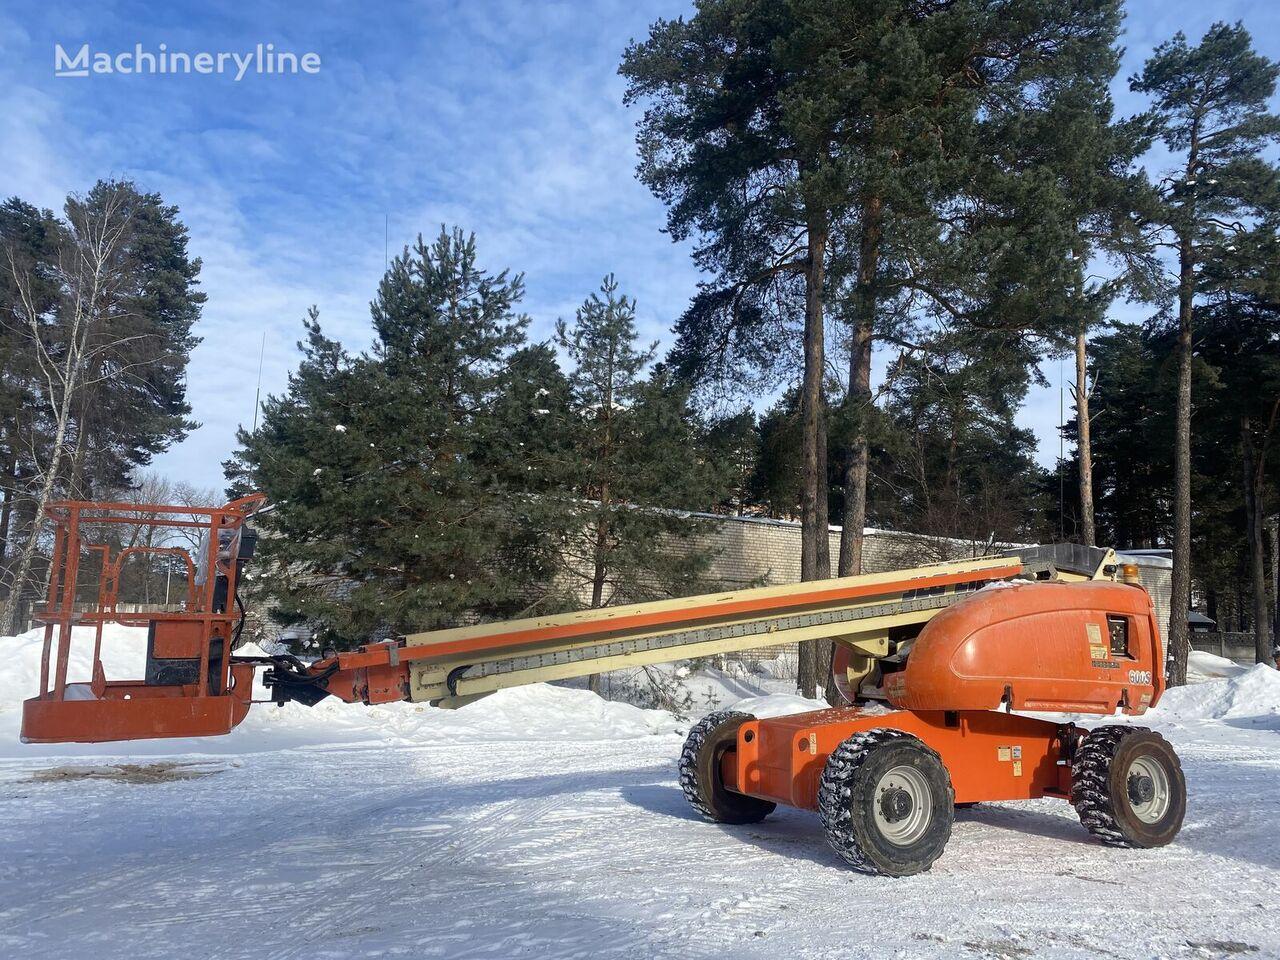 JLG 600 S telescopic boom lift